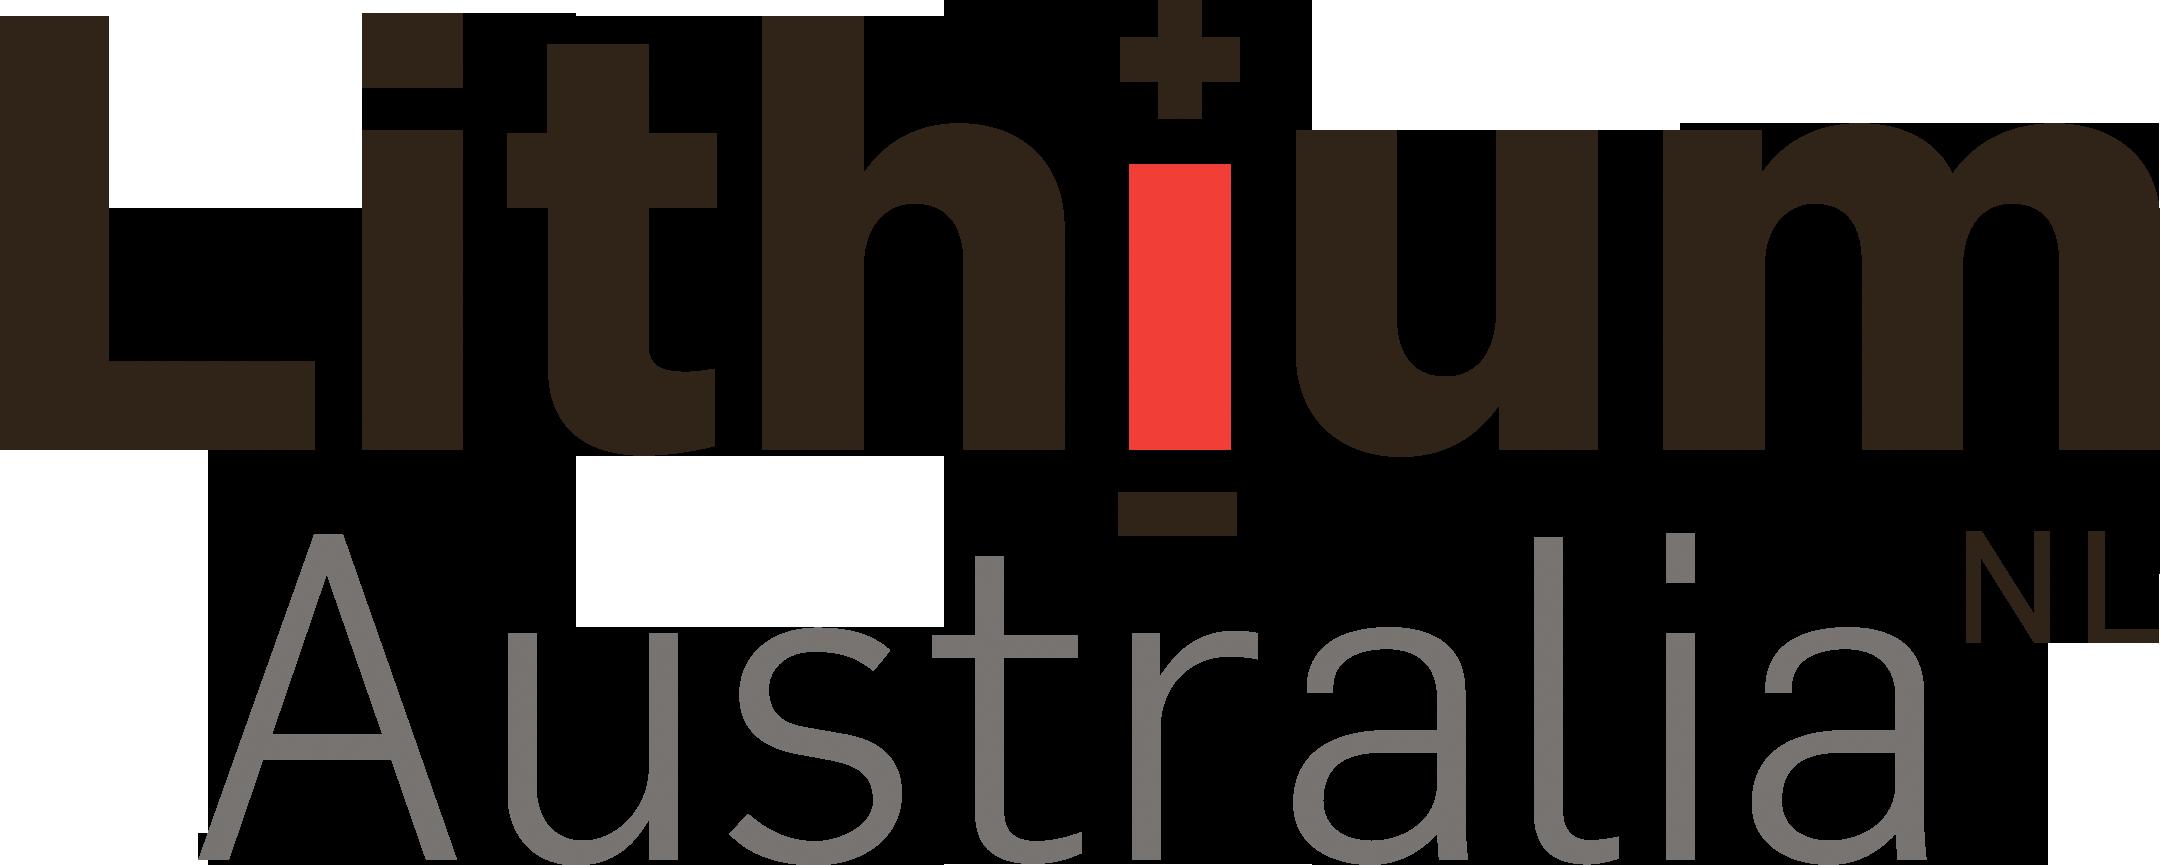 Lithium Australia NL (ASX:LIT) Company Logo